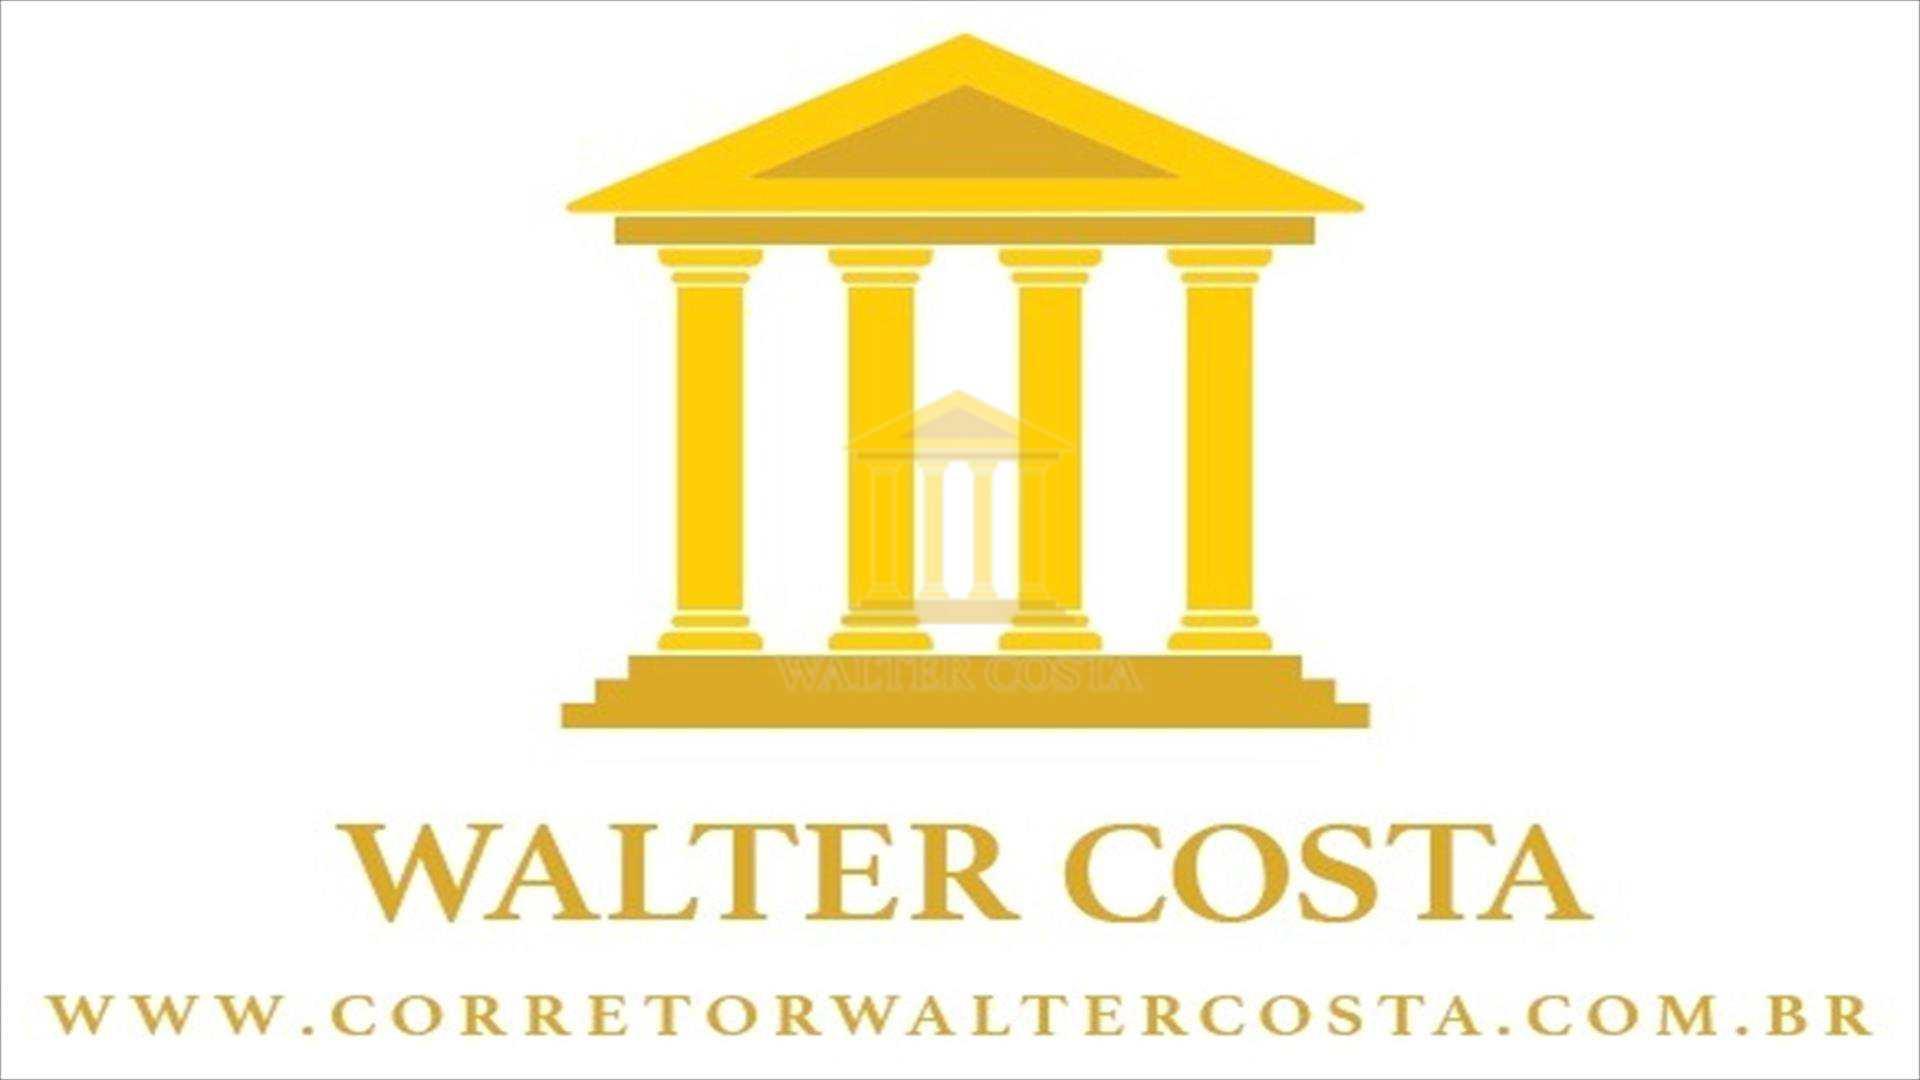 3900-LOGO_CORRETOR_WALTER_COSTA_NOVO.jpg